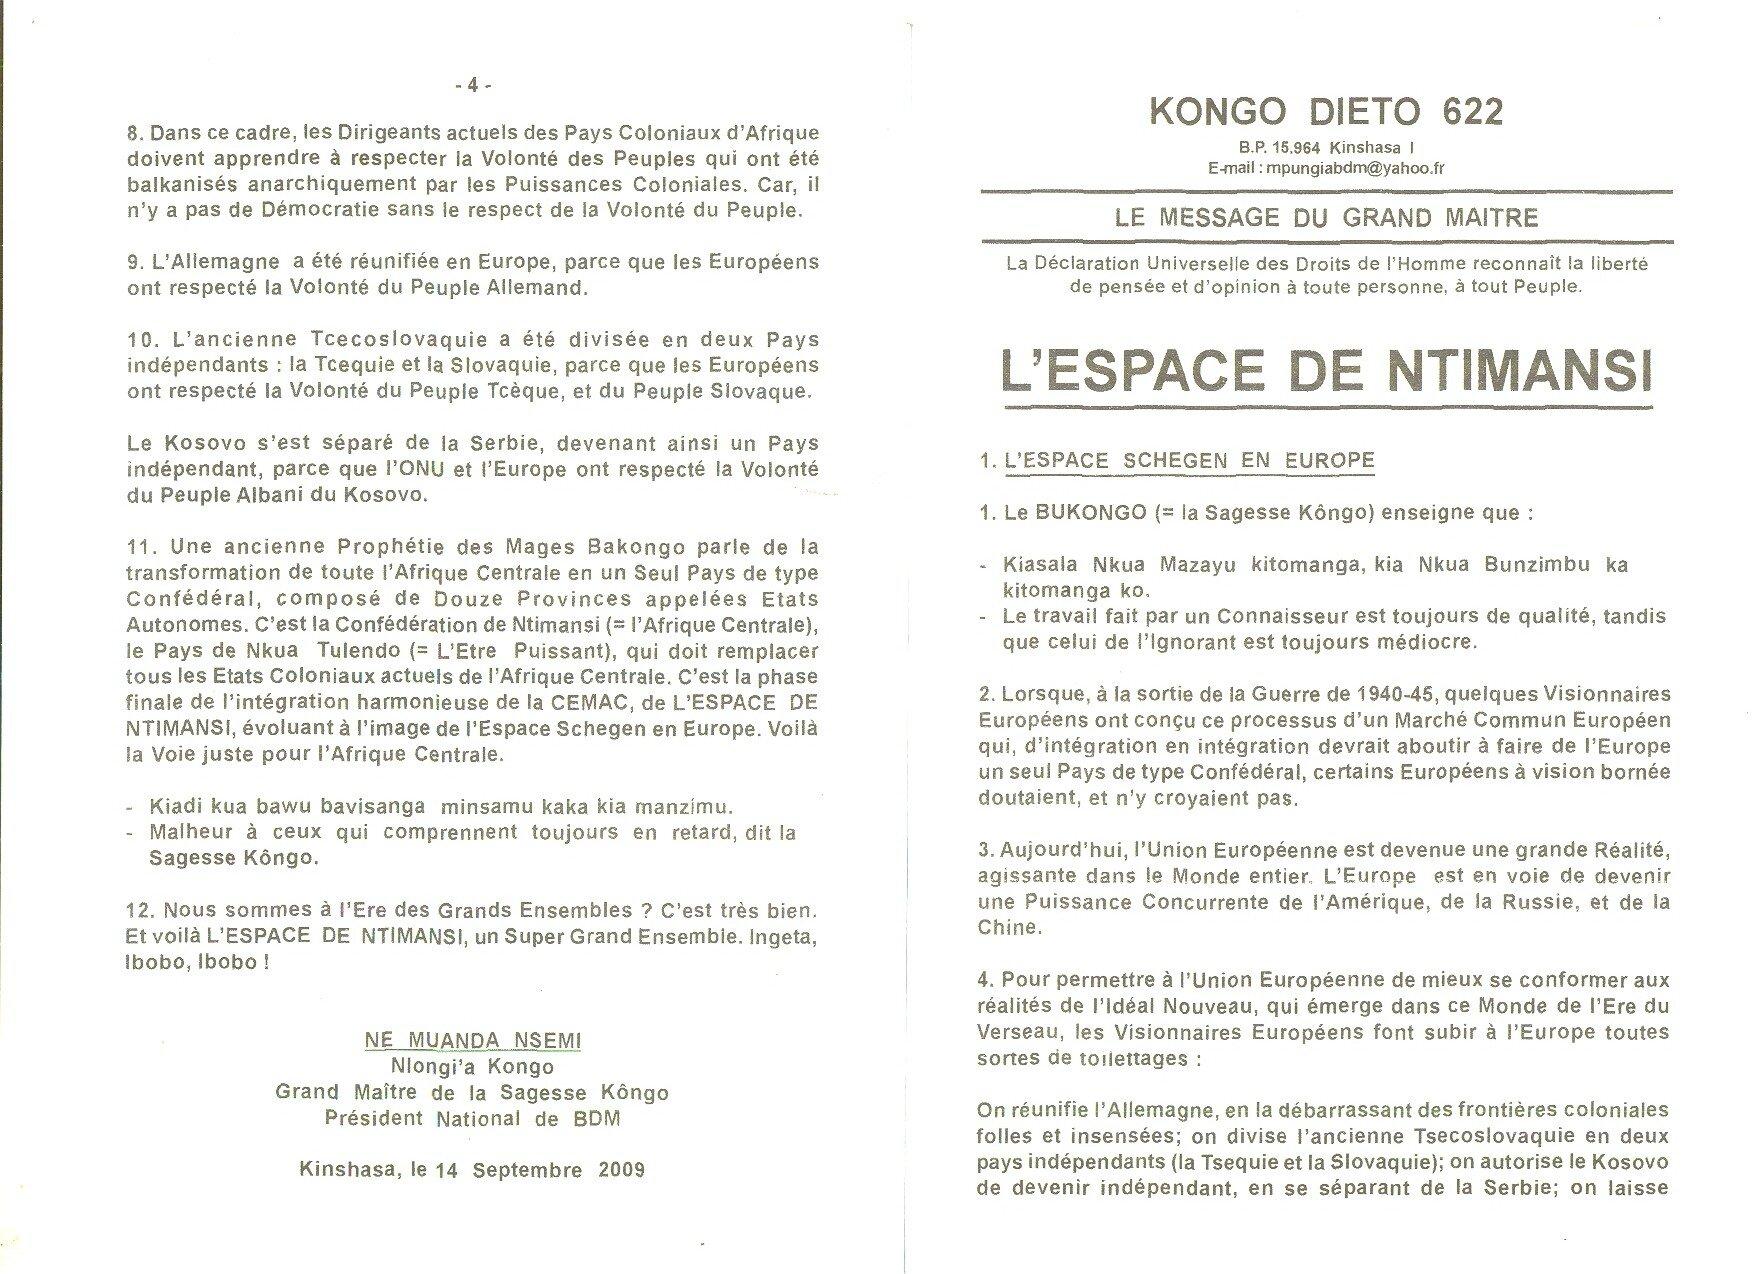 L'ESPACE DE NTIMANSI 1